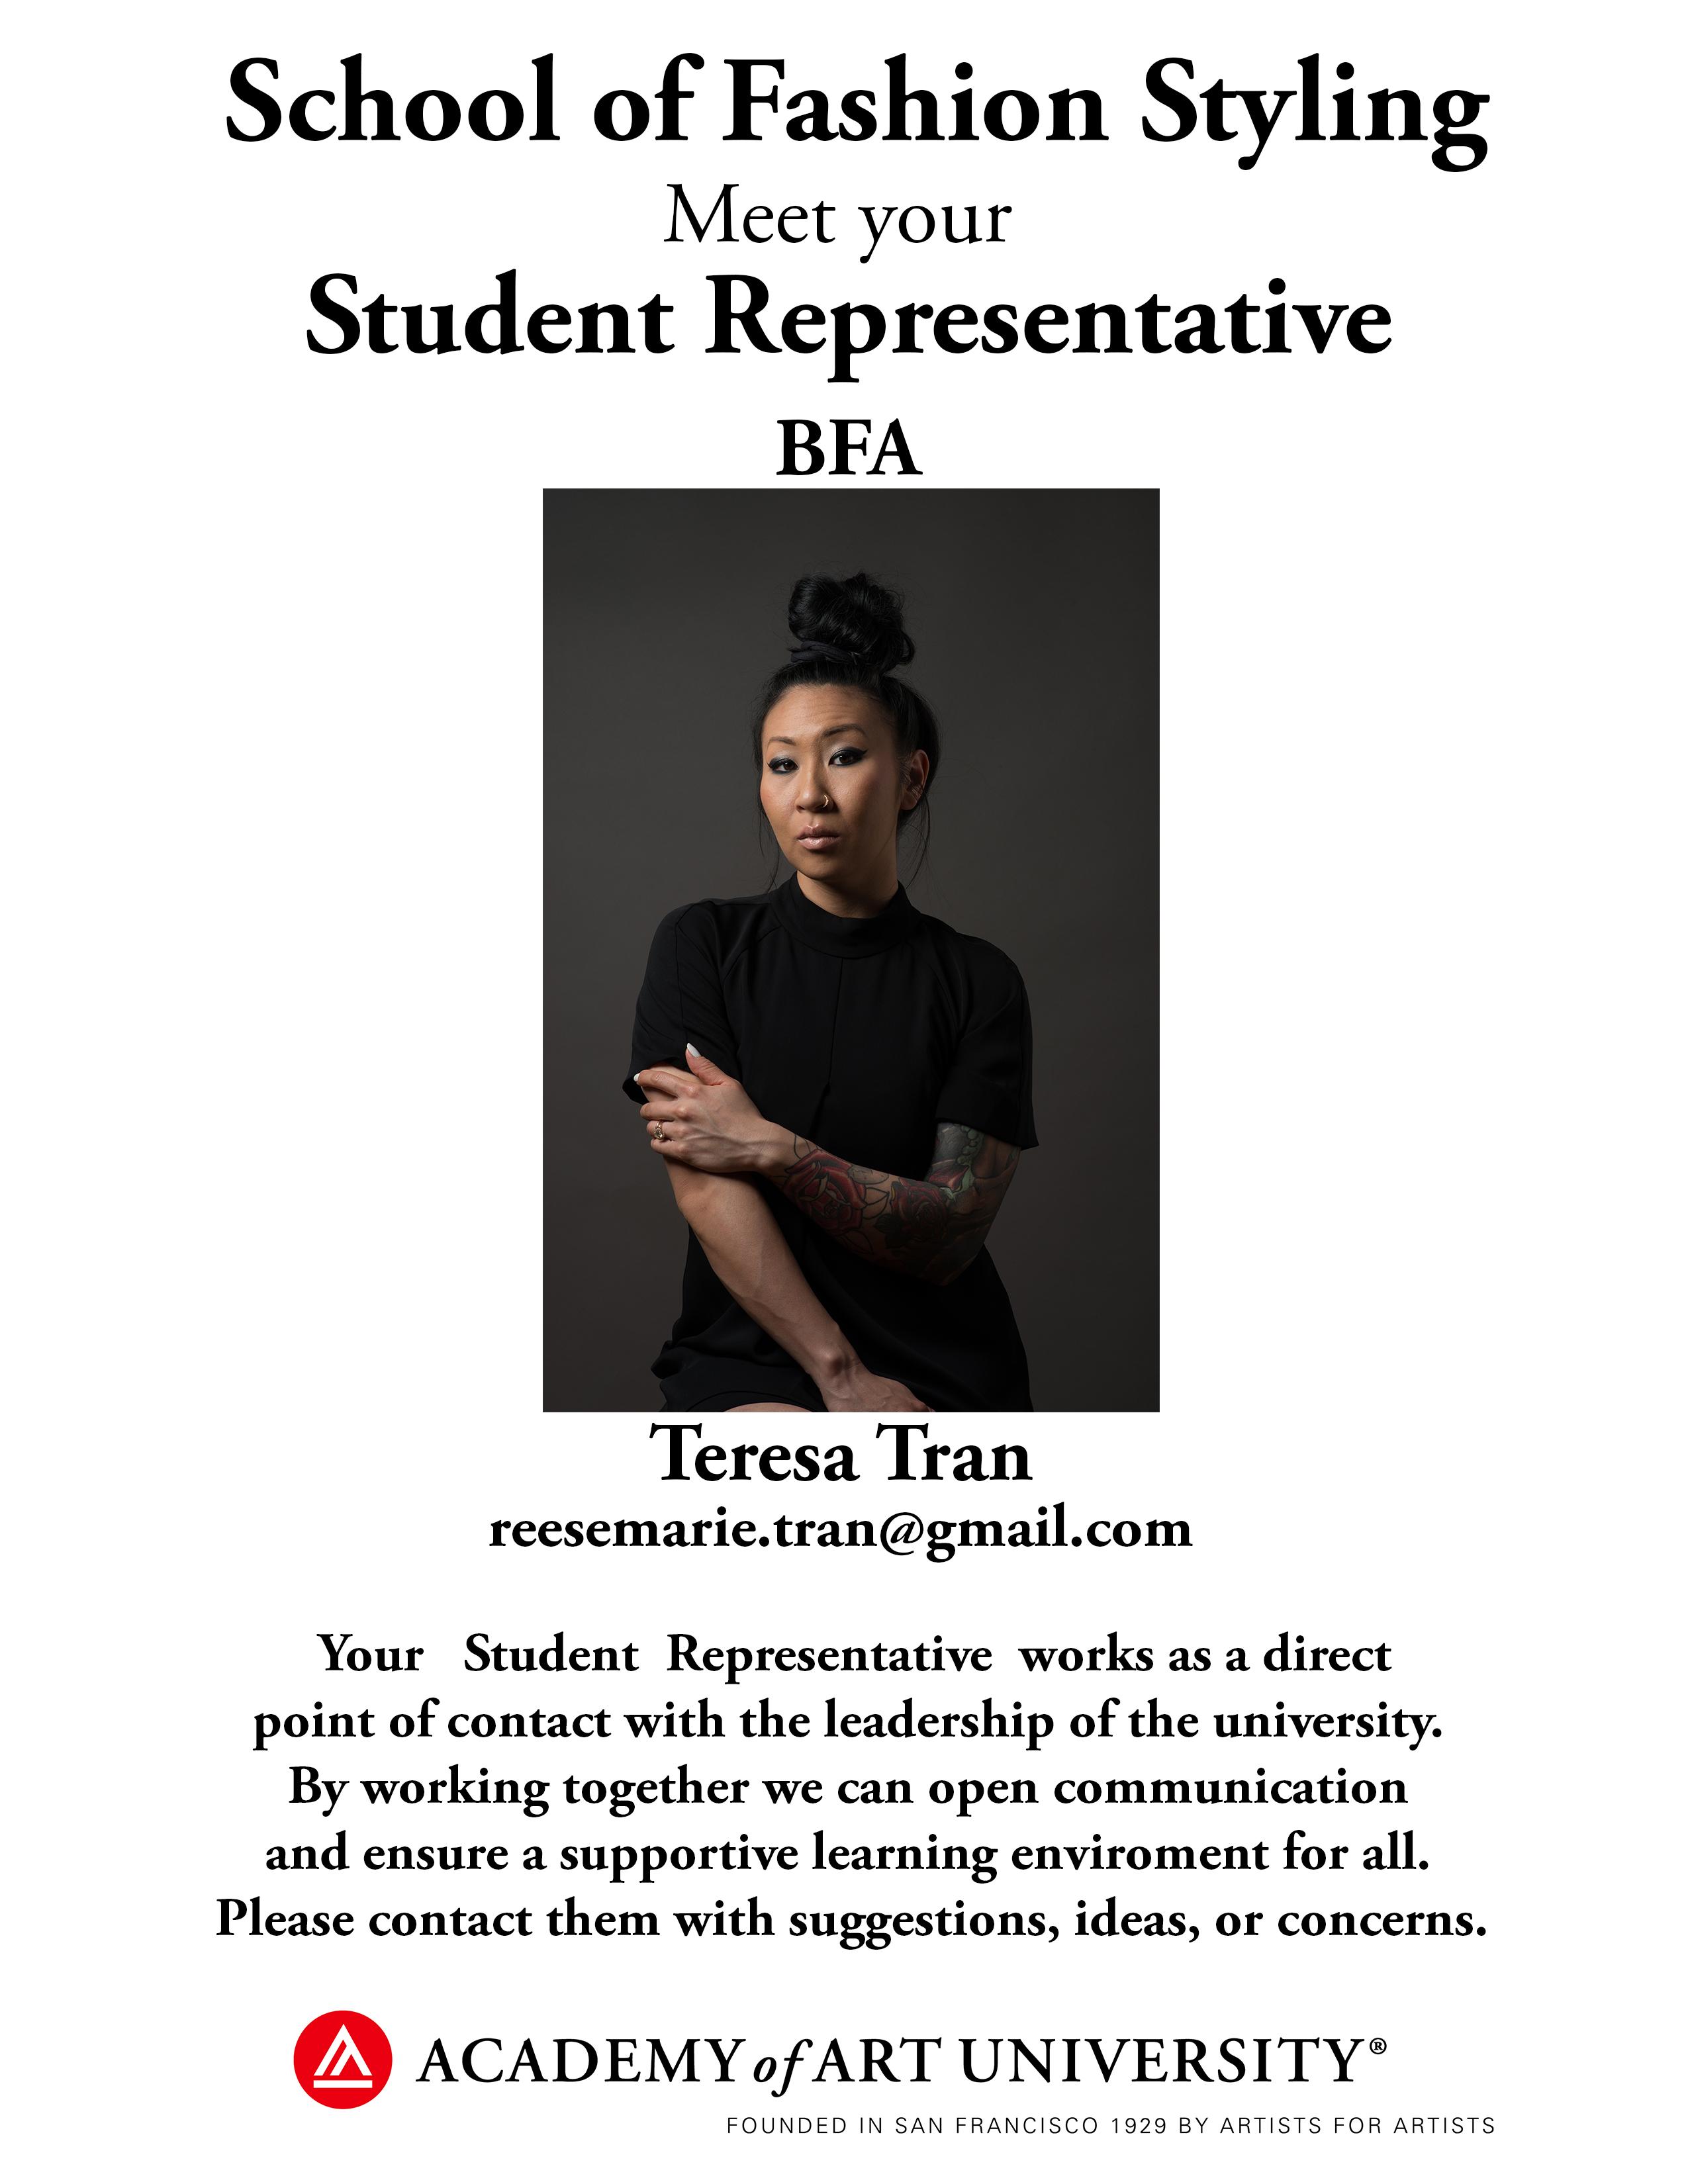 BFA Fashion Styling student representative Teresa Tran/email: reesemarie.tran@gmail.com